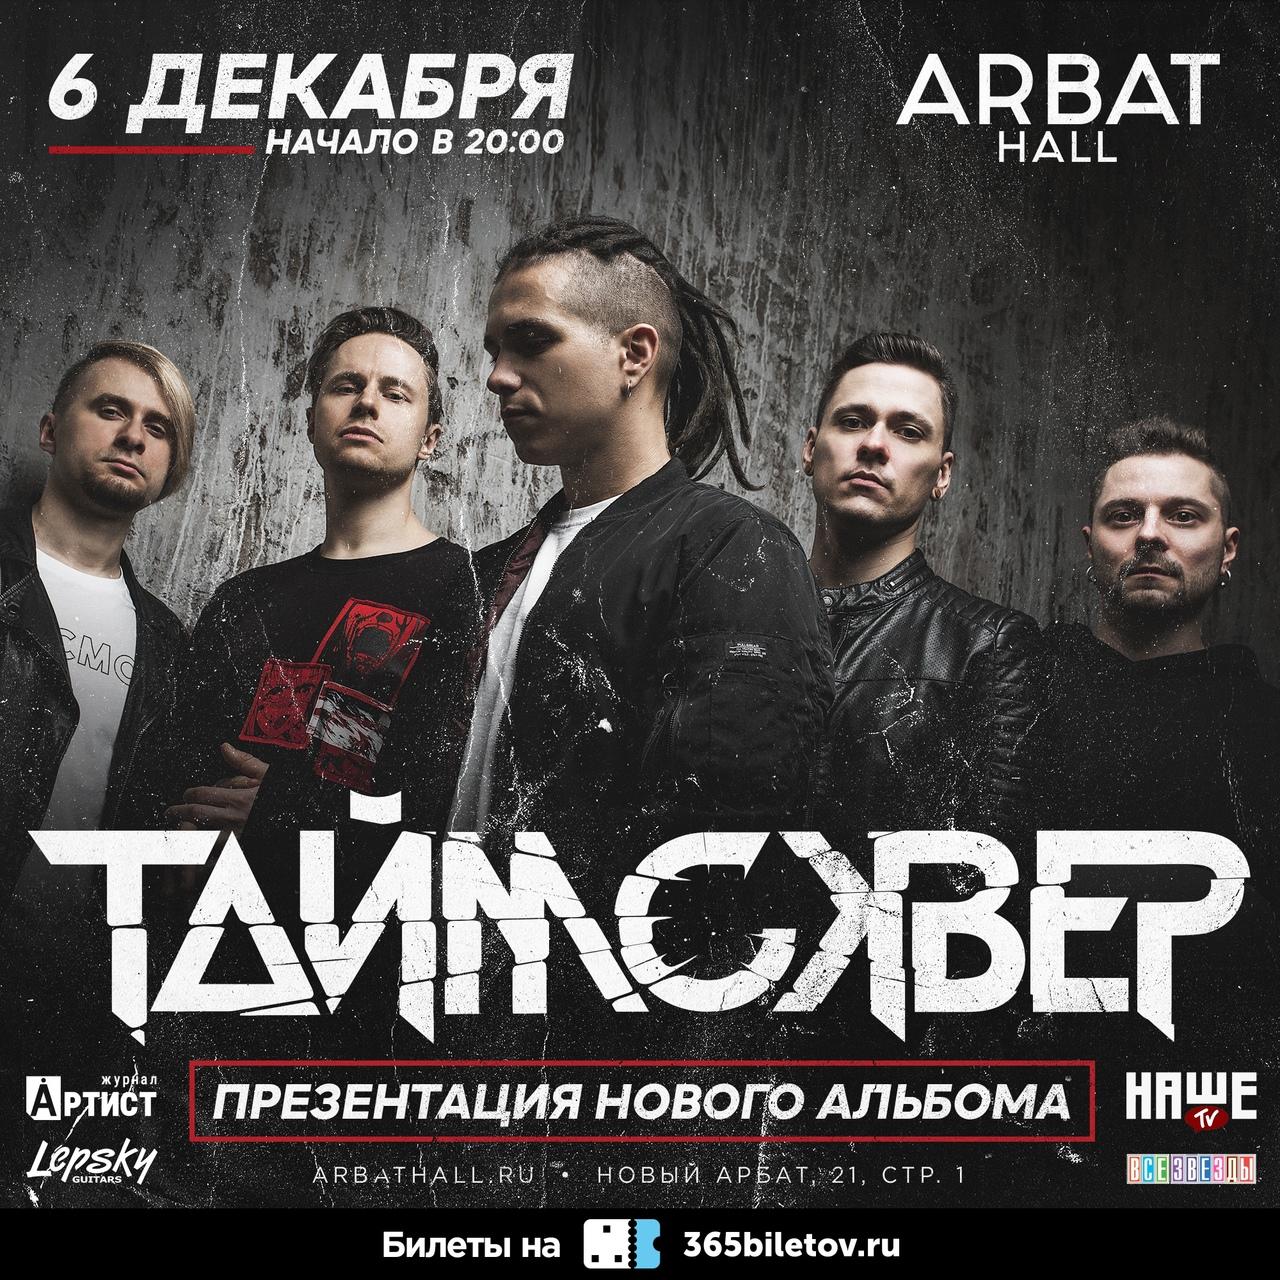 Афиша Москва 6 декабря - ТАйМСКВЕР МОСКВА, Arbat Hall